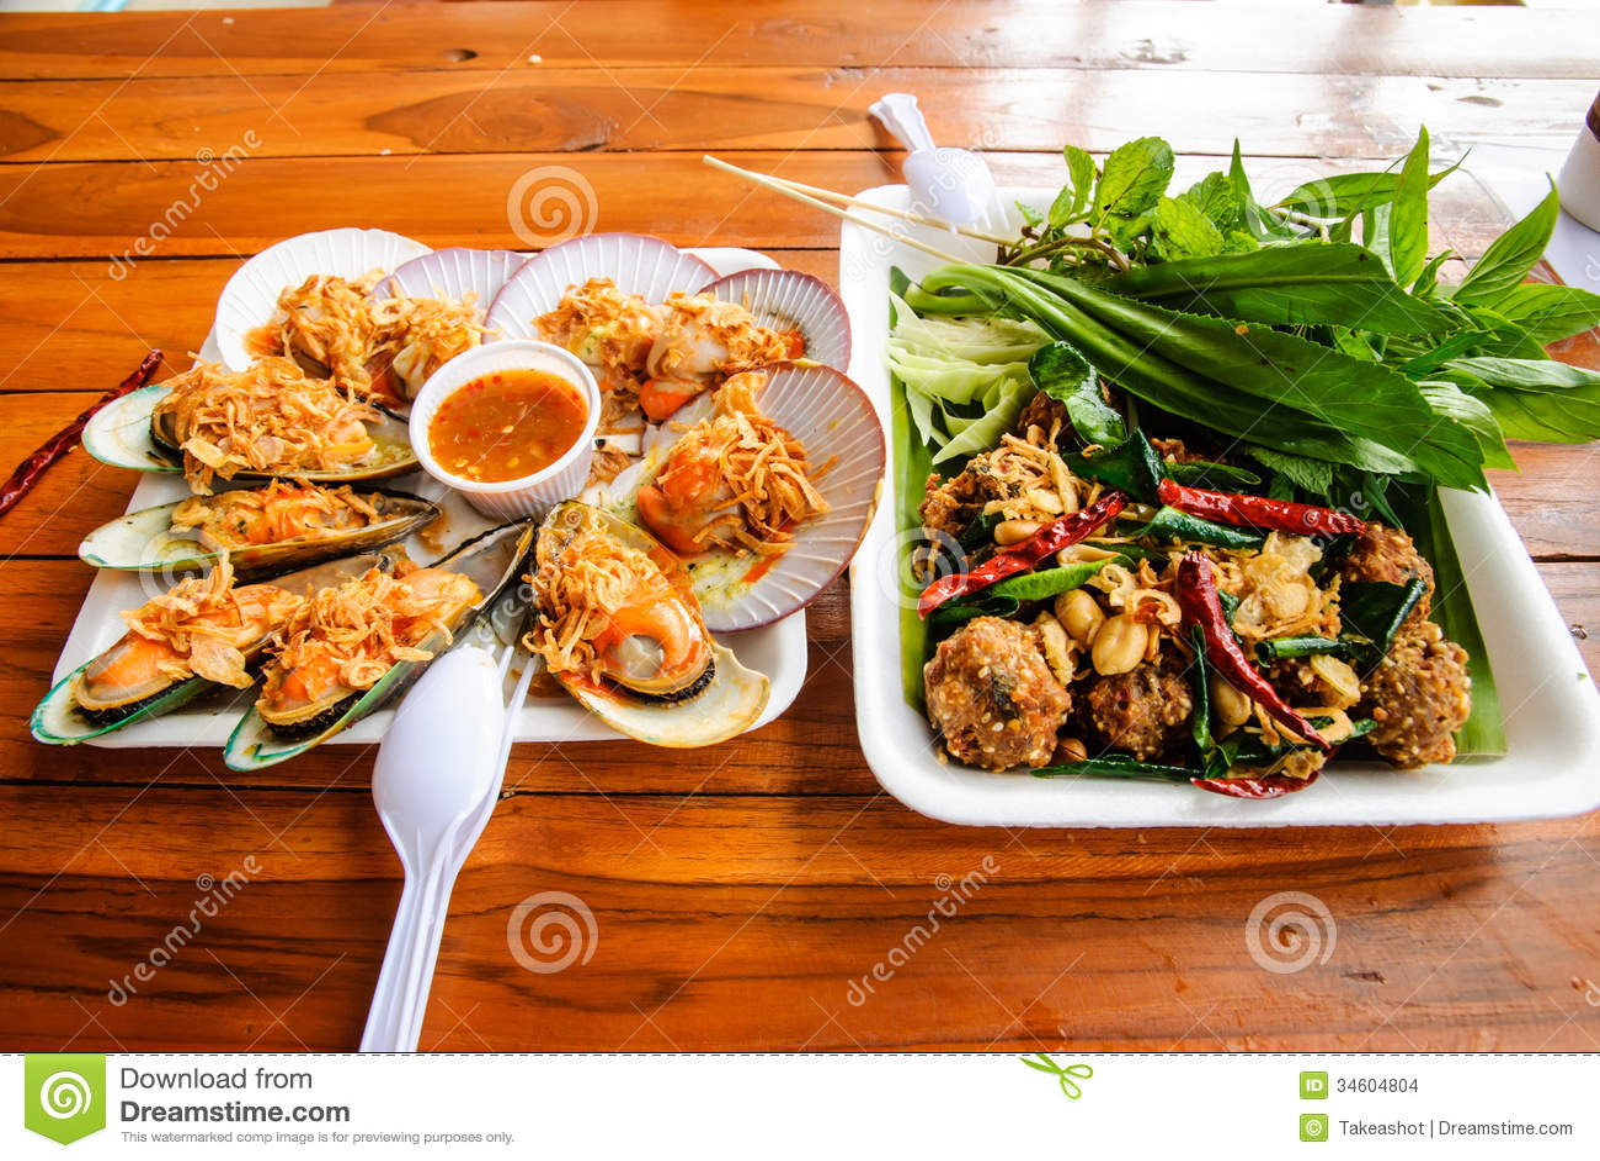 Thai dish kamasutra porn videos - Video kamasutra cuisine ...